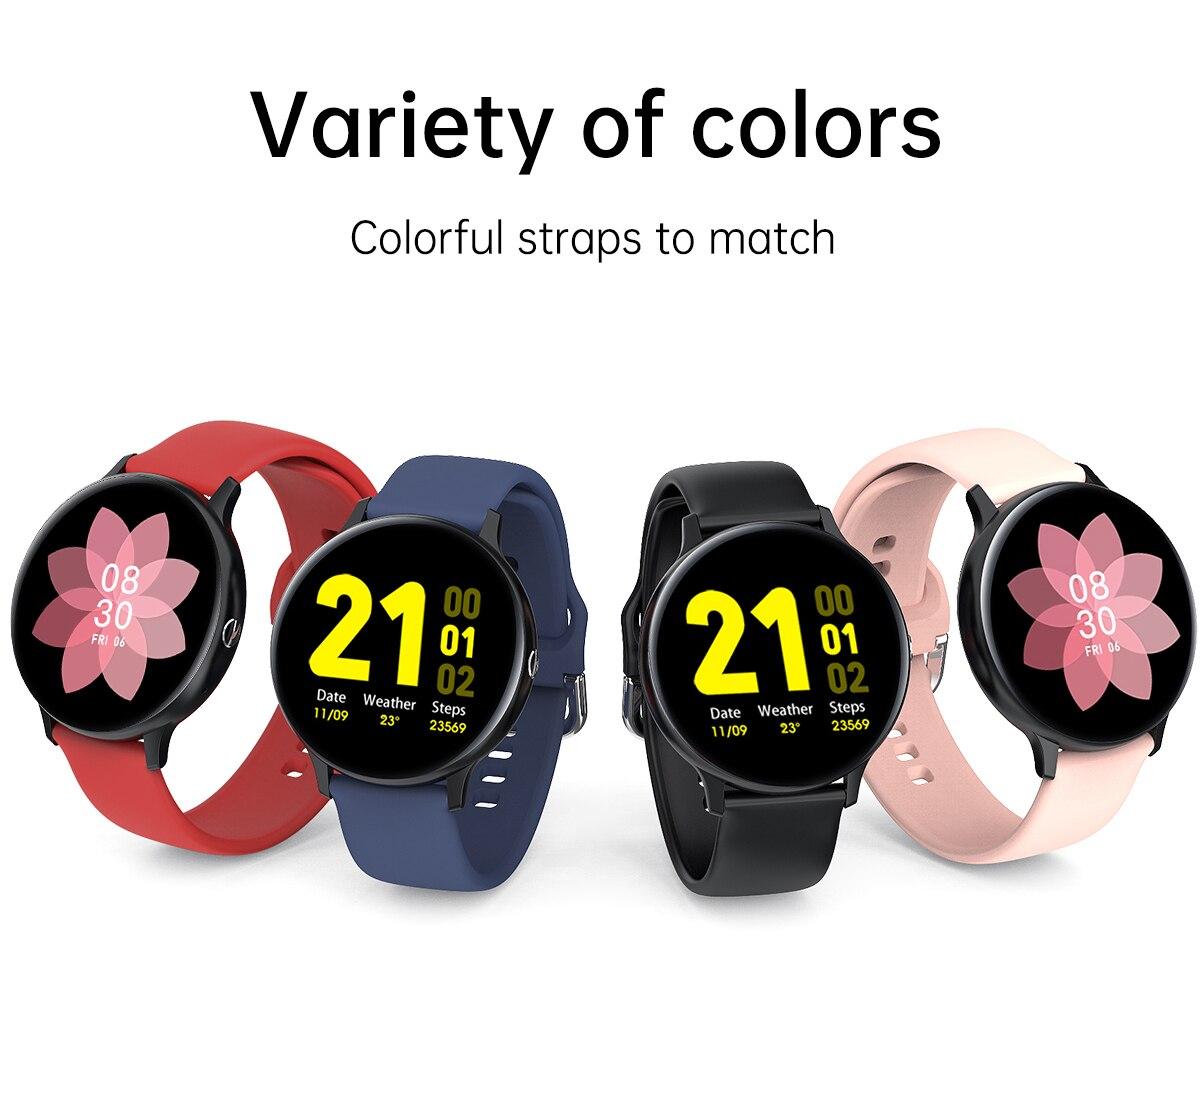 H0fddb37d0e4d4a11a5bd70ad5136b01aO LIGE 2021 New Bluetooth call smart watch men women Sport mode Heart rate and blood pressure monitor Activity tracker Smartwatch